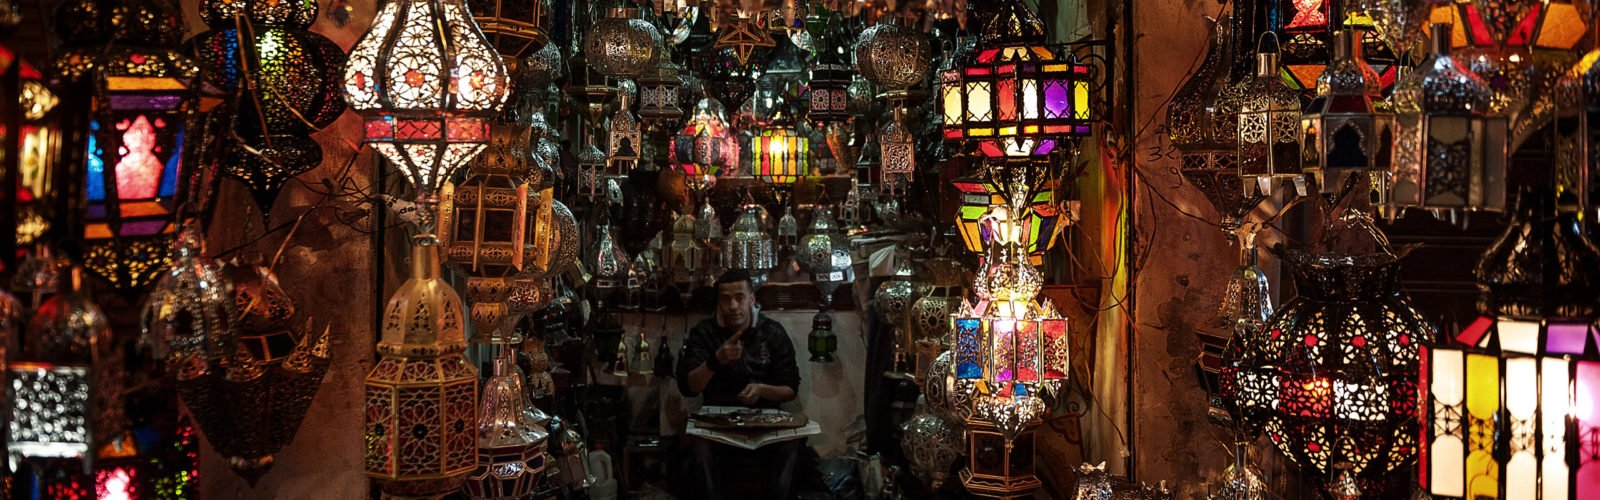 marrakech-souks-morocco